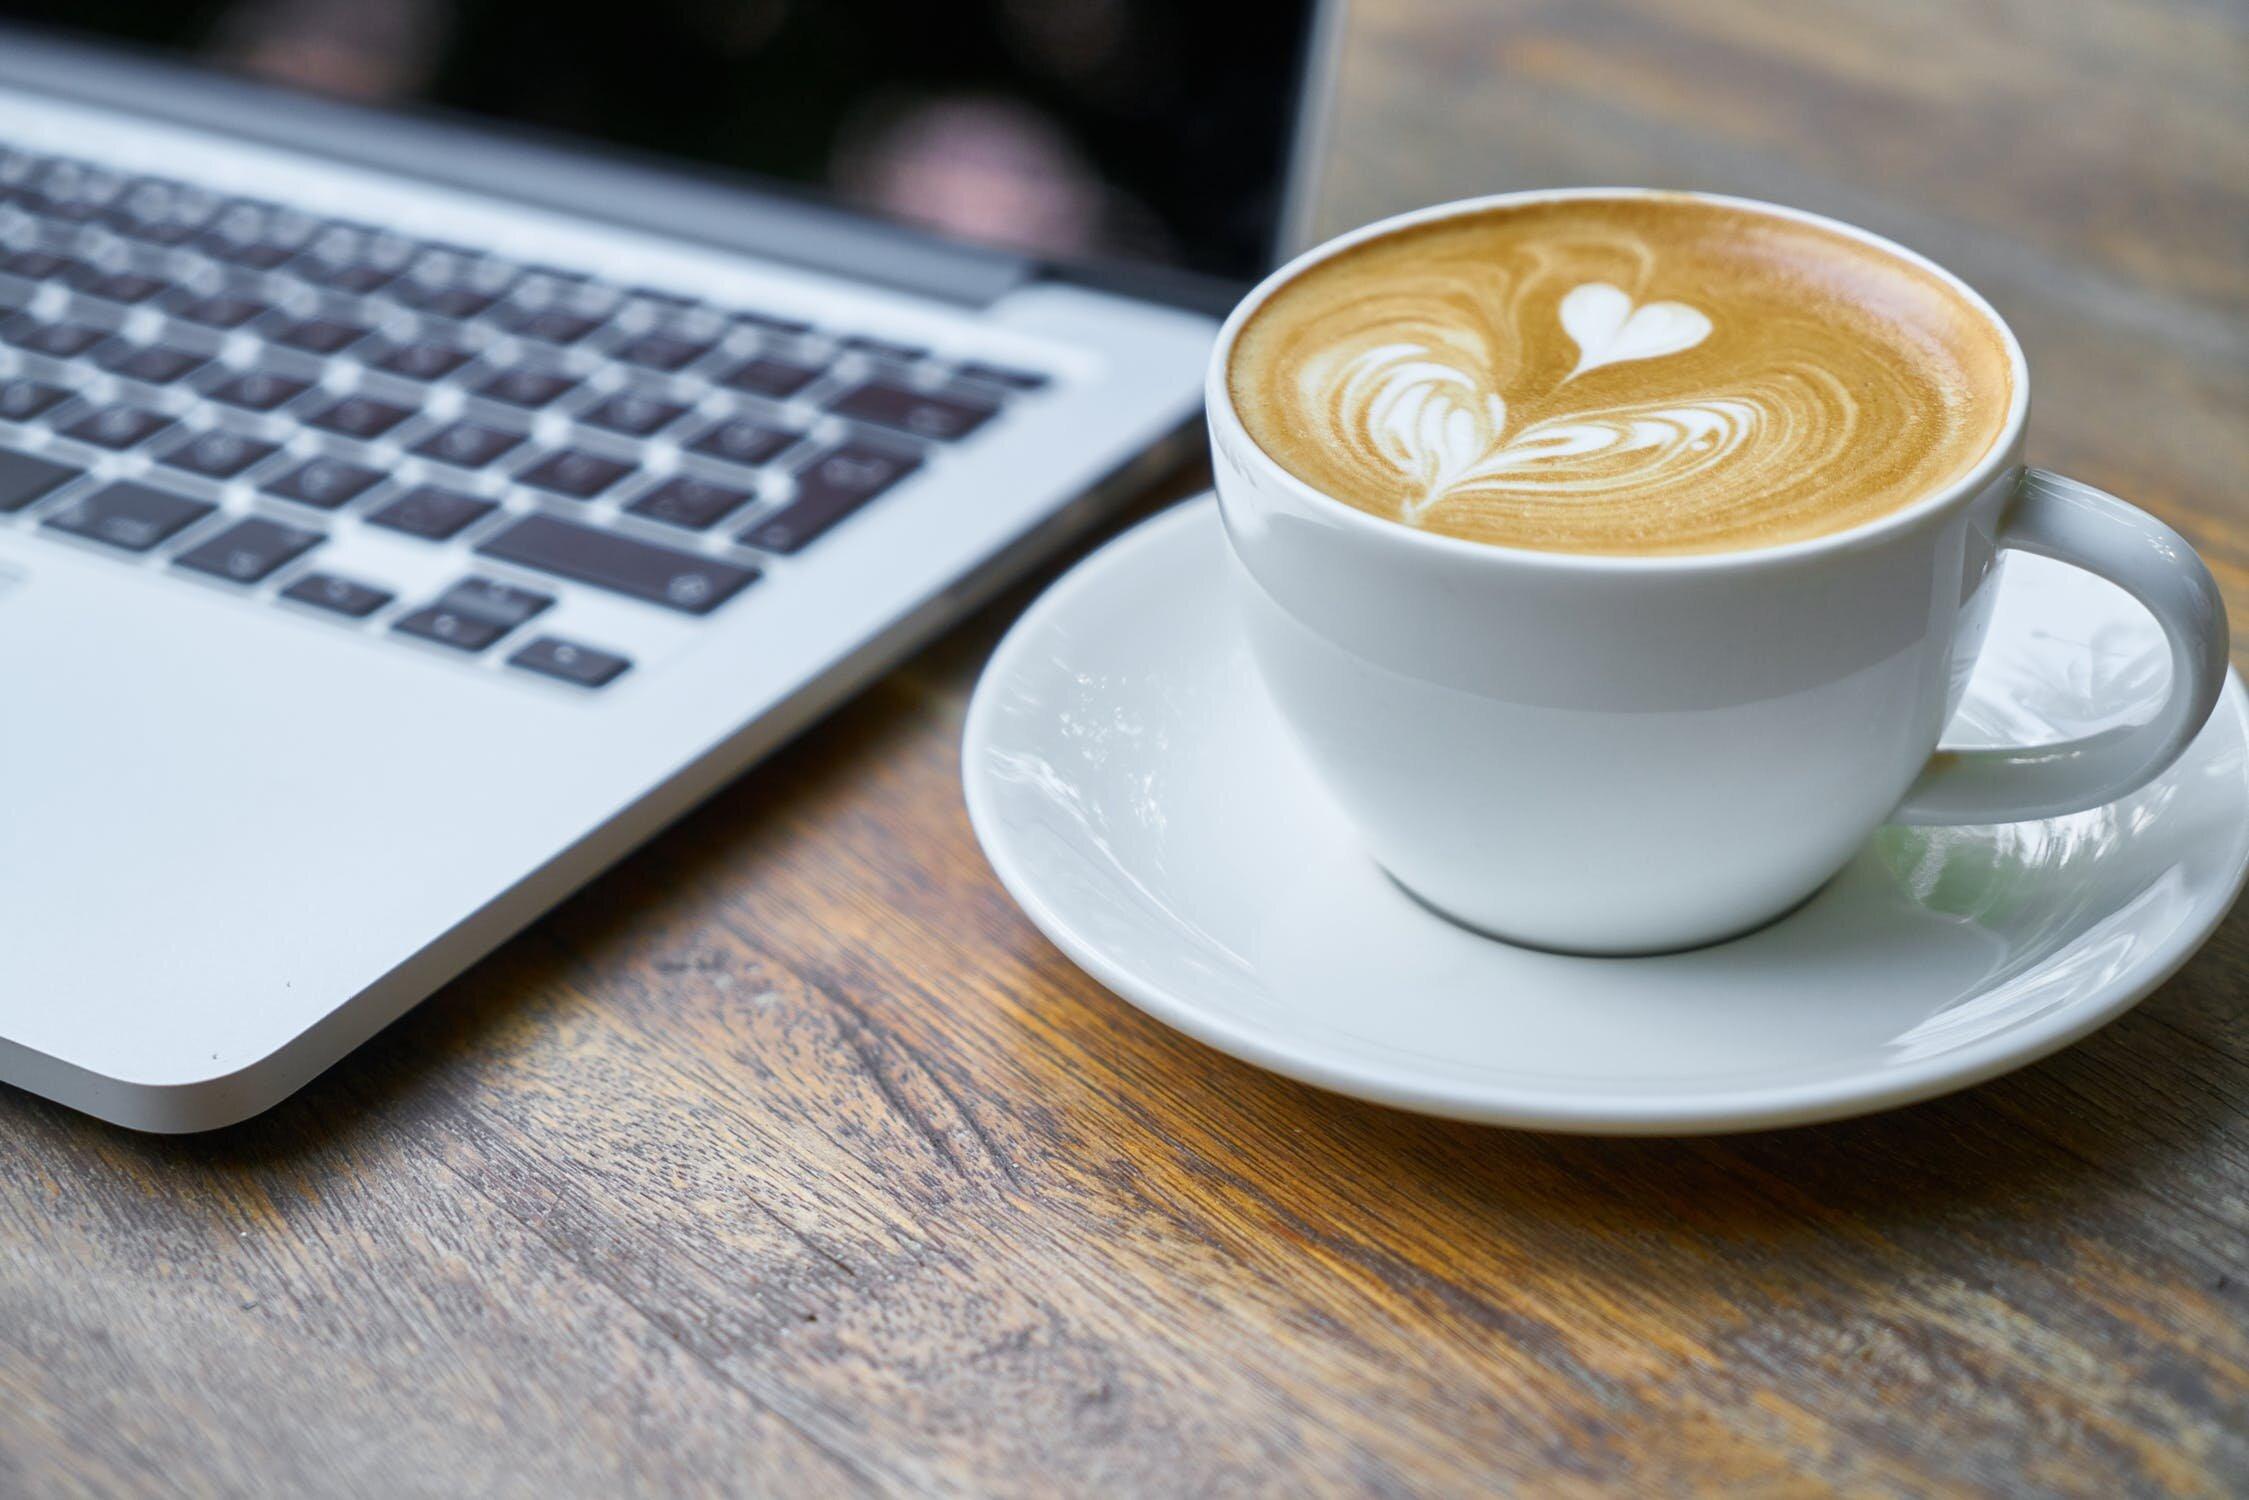 Koffie-en-thee-op-het-werk